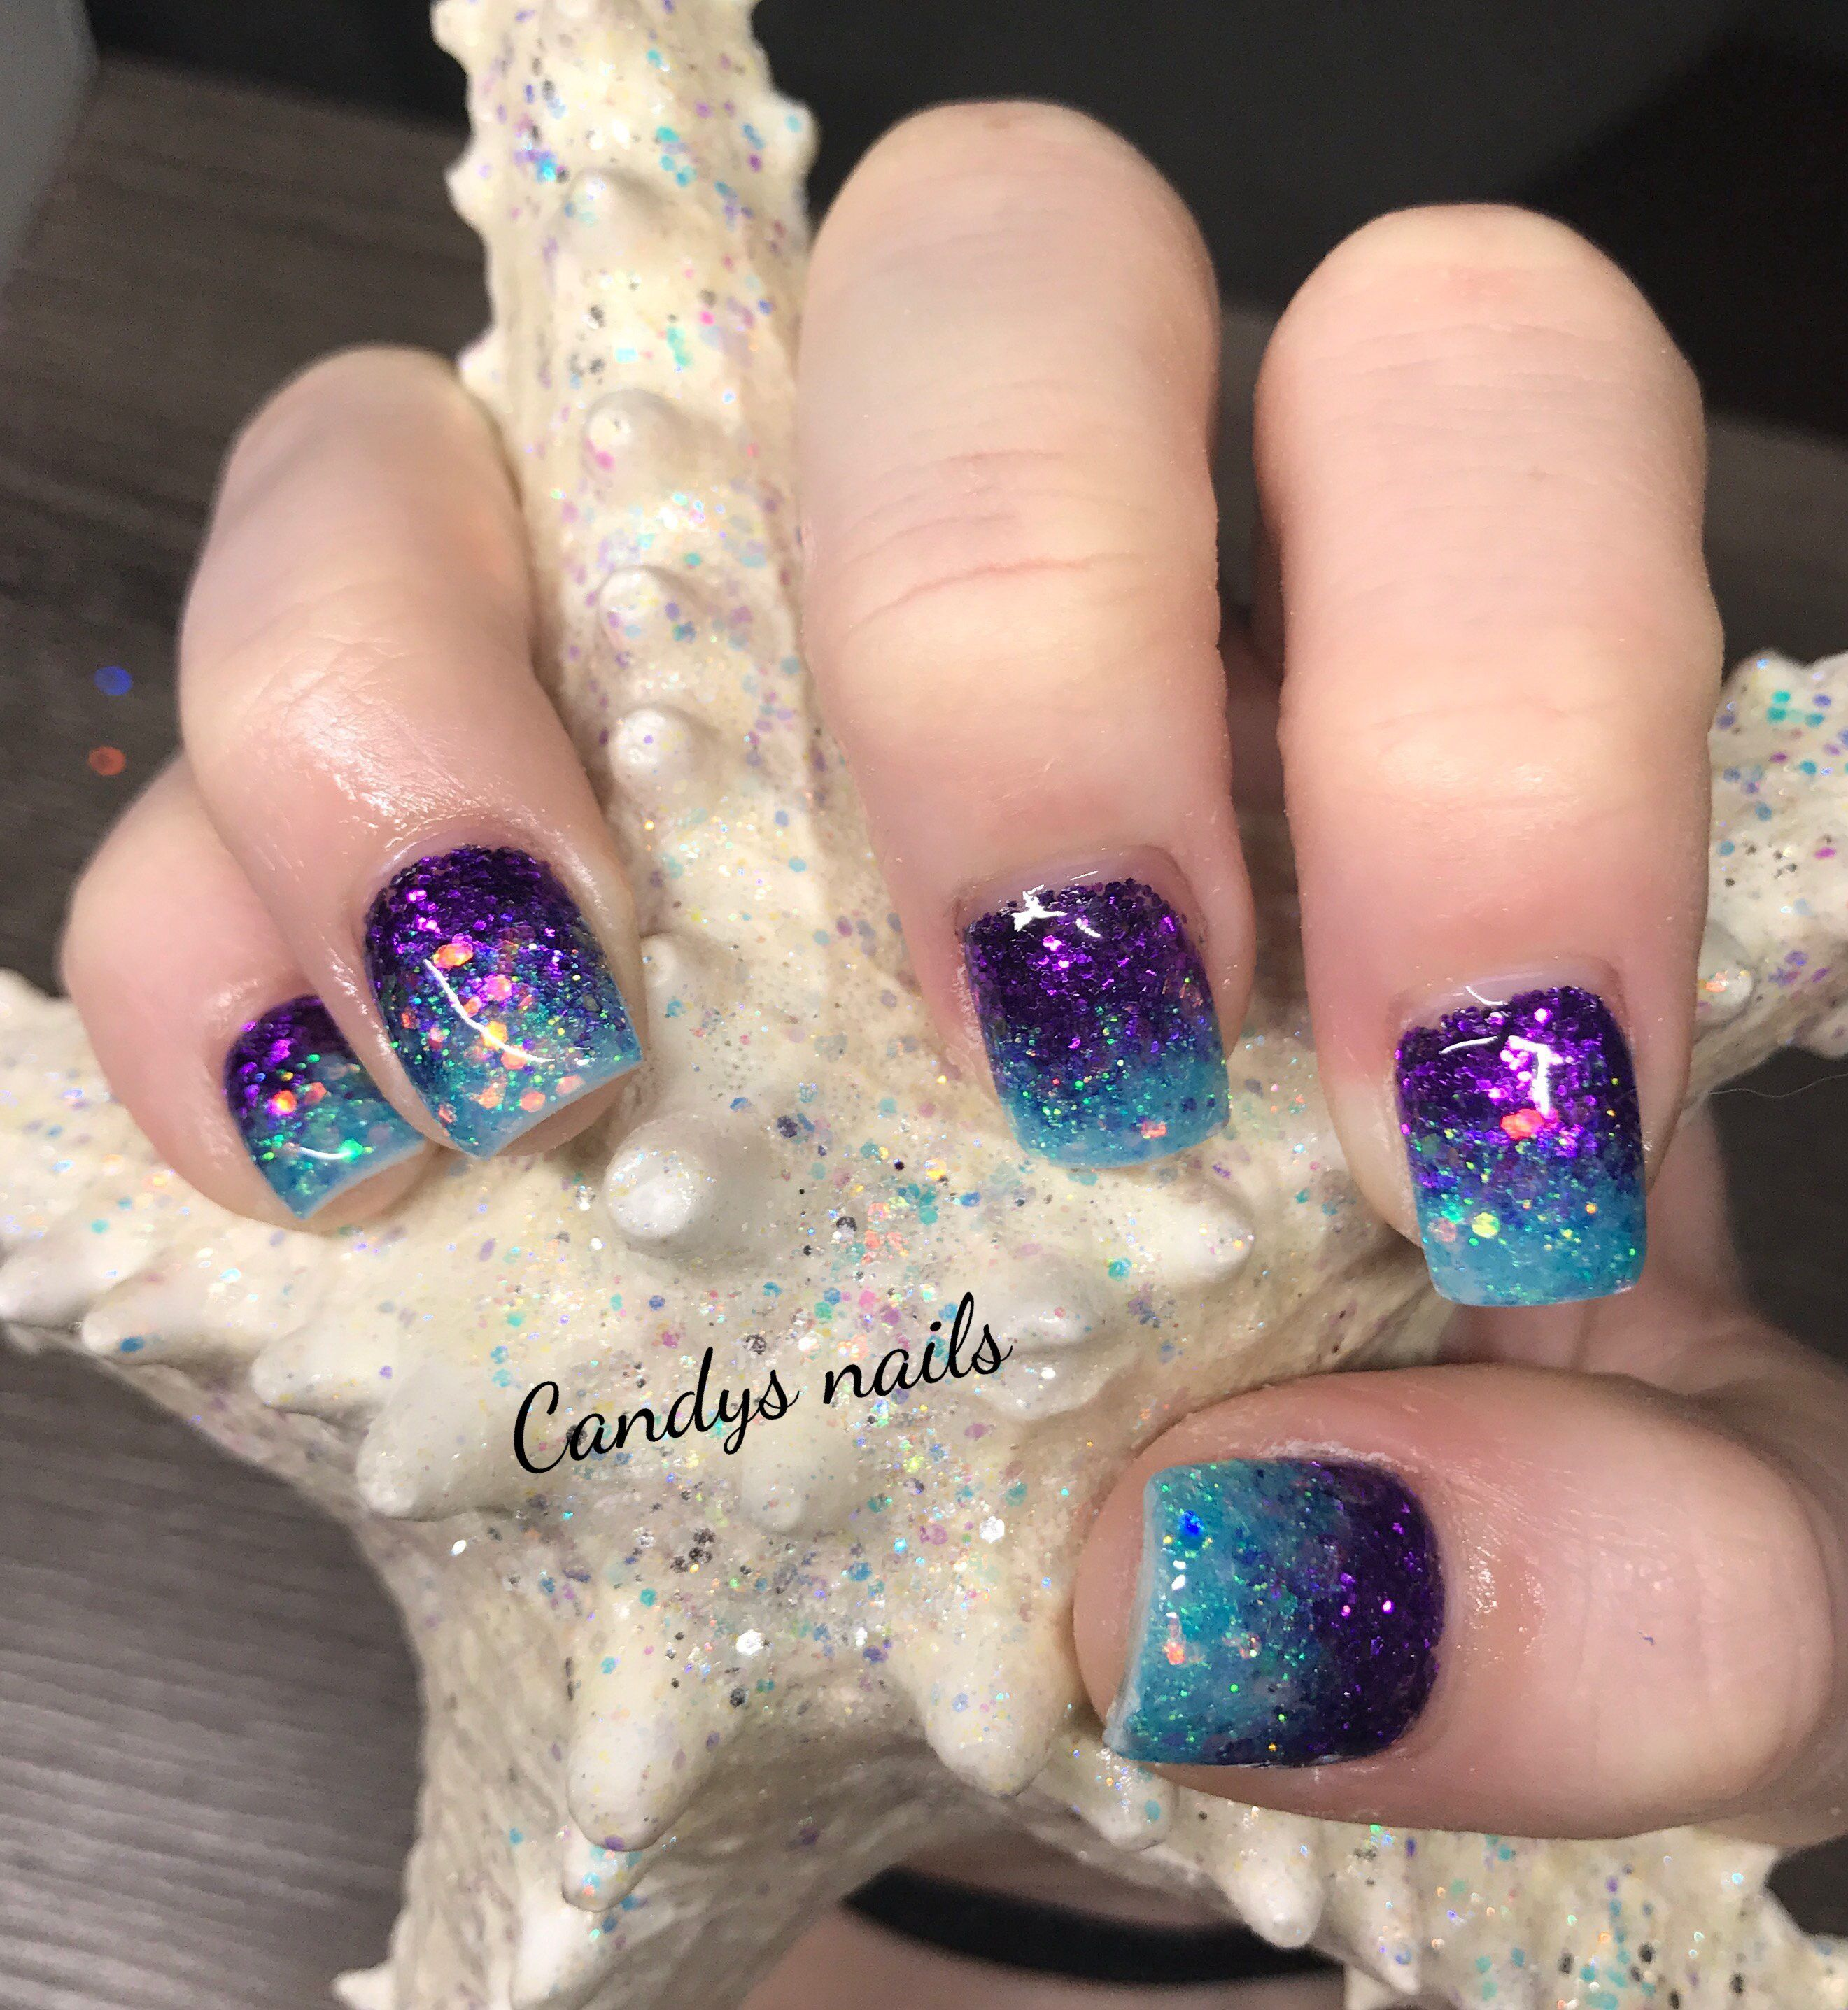 teal purple fade mermaid acrylic